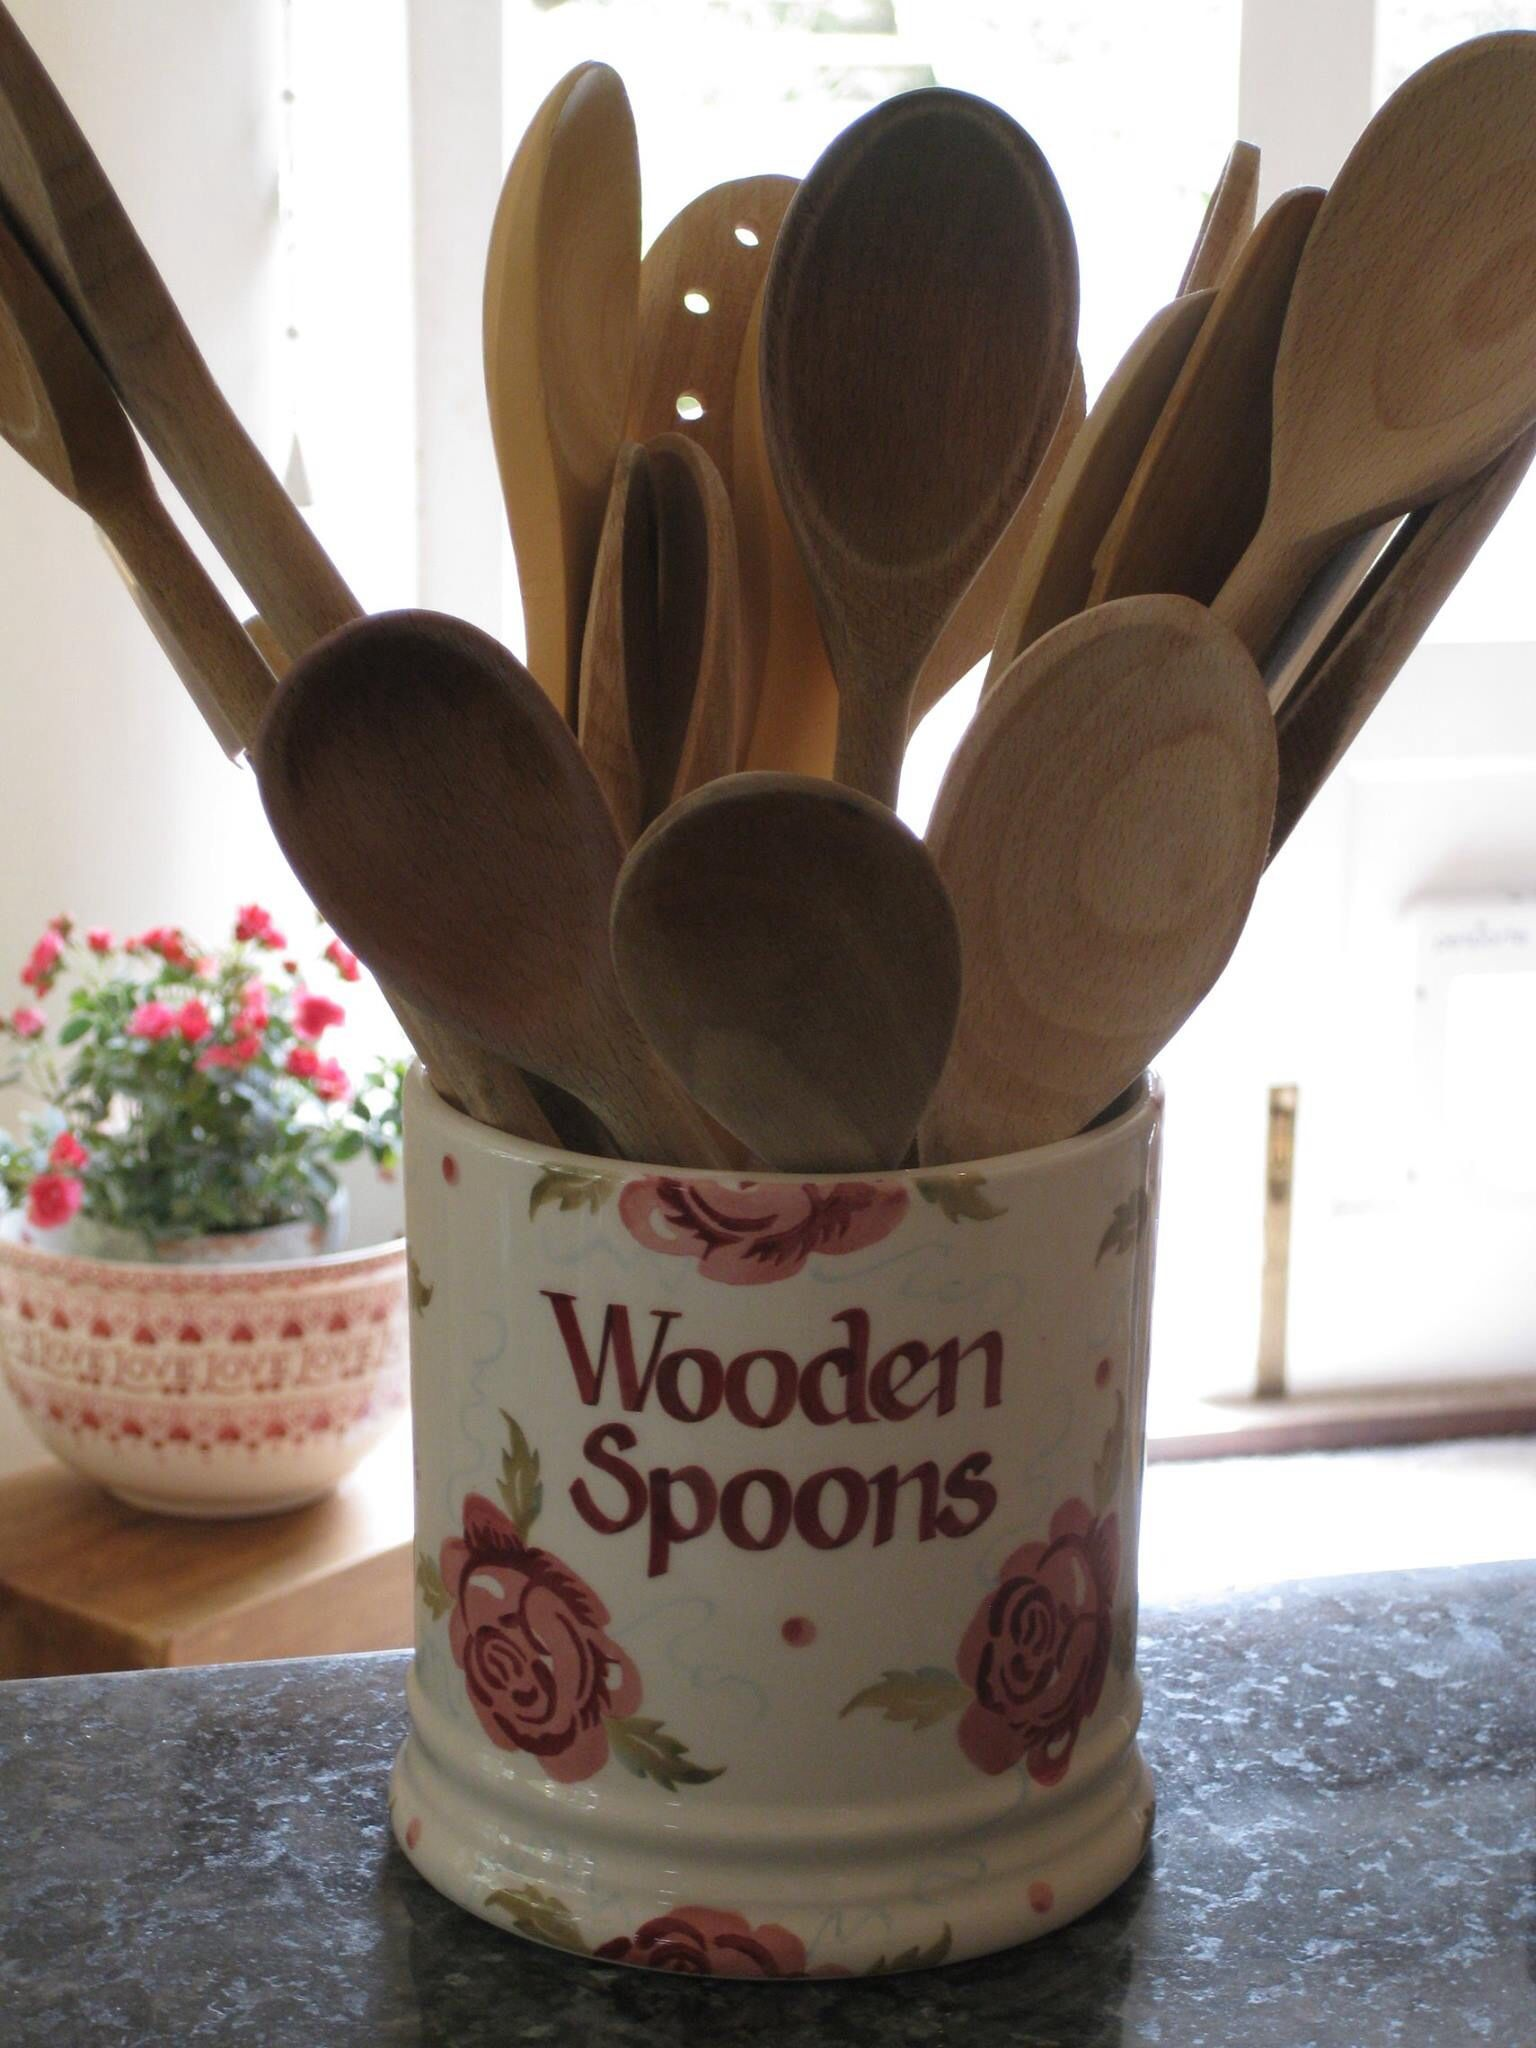 Emma Bridgewater Rose Bee Personalised 2 Pint Storage Jar For Your Wooden Spoons 2014